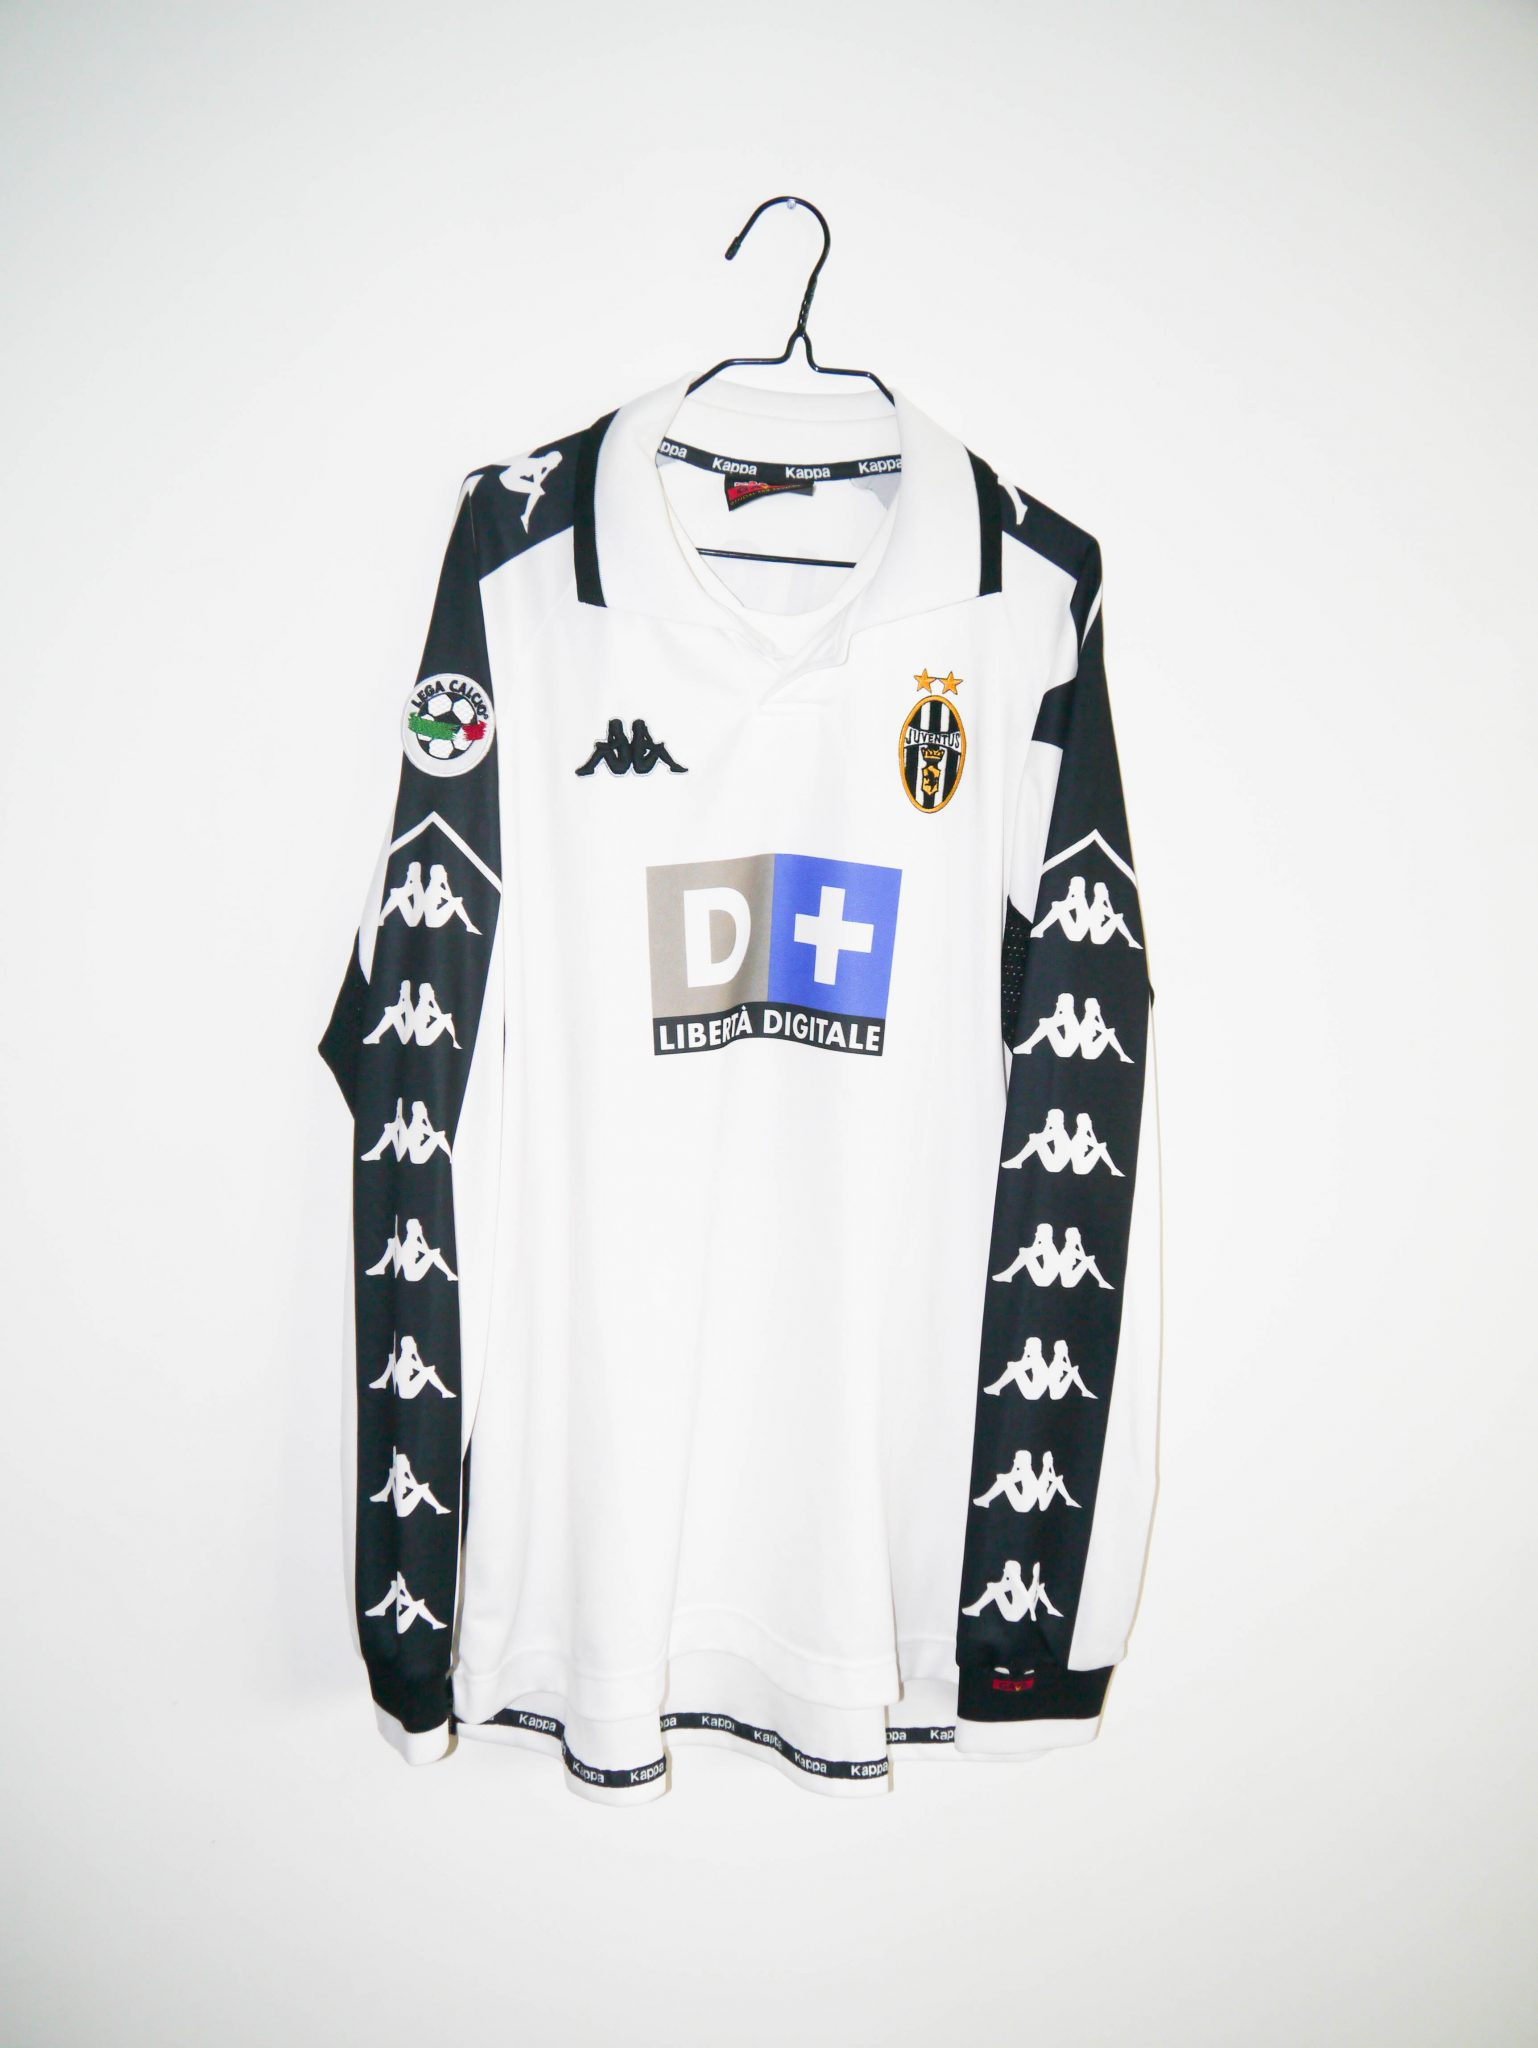 8a2795cf4 Ebay Vintage West Germany Football Shirts - Nils Stucki Kieferorthopäde